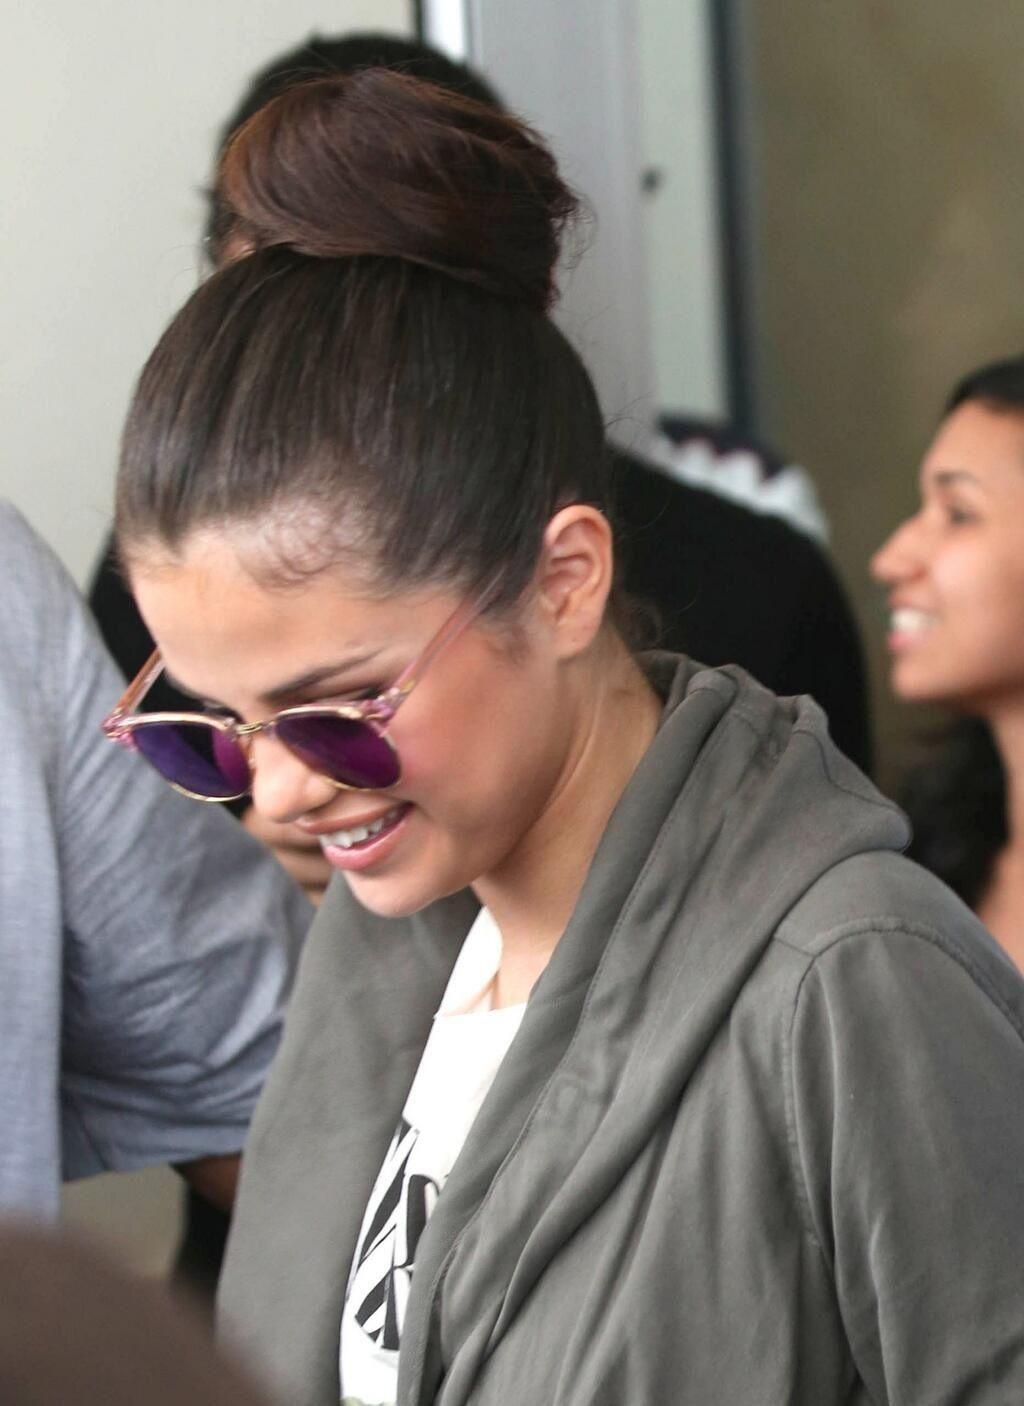 Superb Selena Gomez Buns And Selena On Pinterest Hairstyles For Women Draintrainus